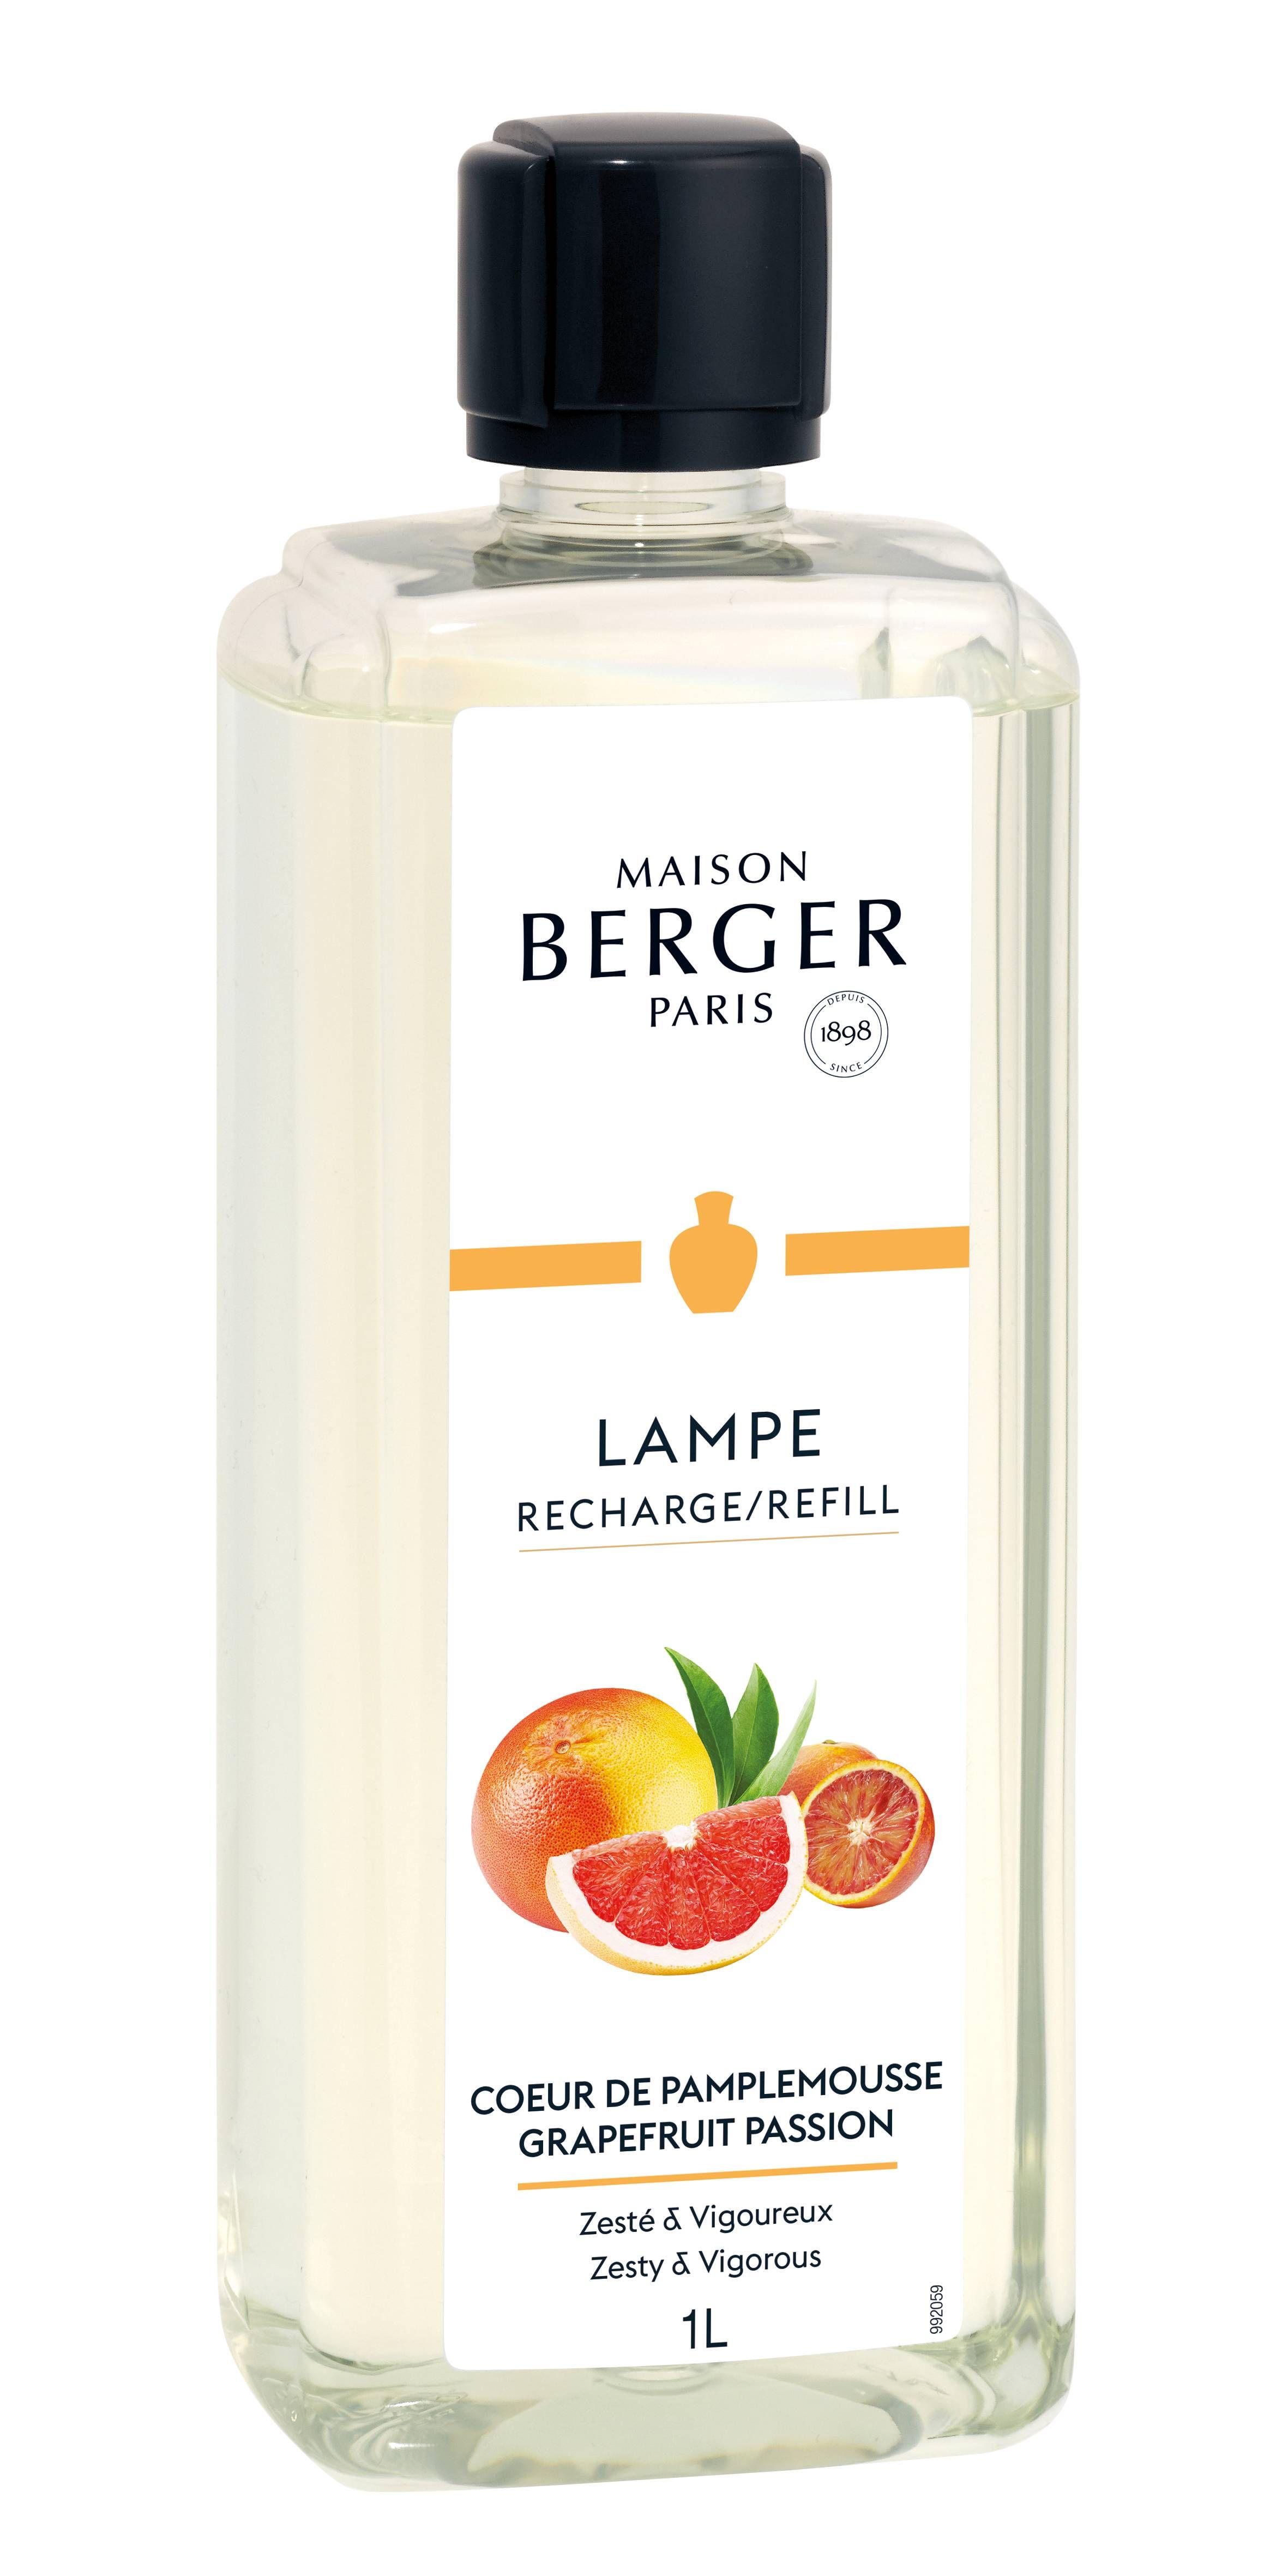 lampe-berger-navulling-1liter-grapefruit-passion